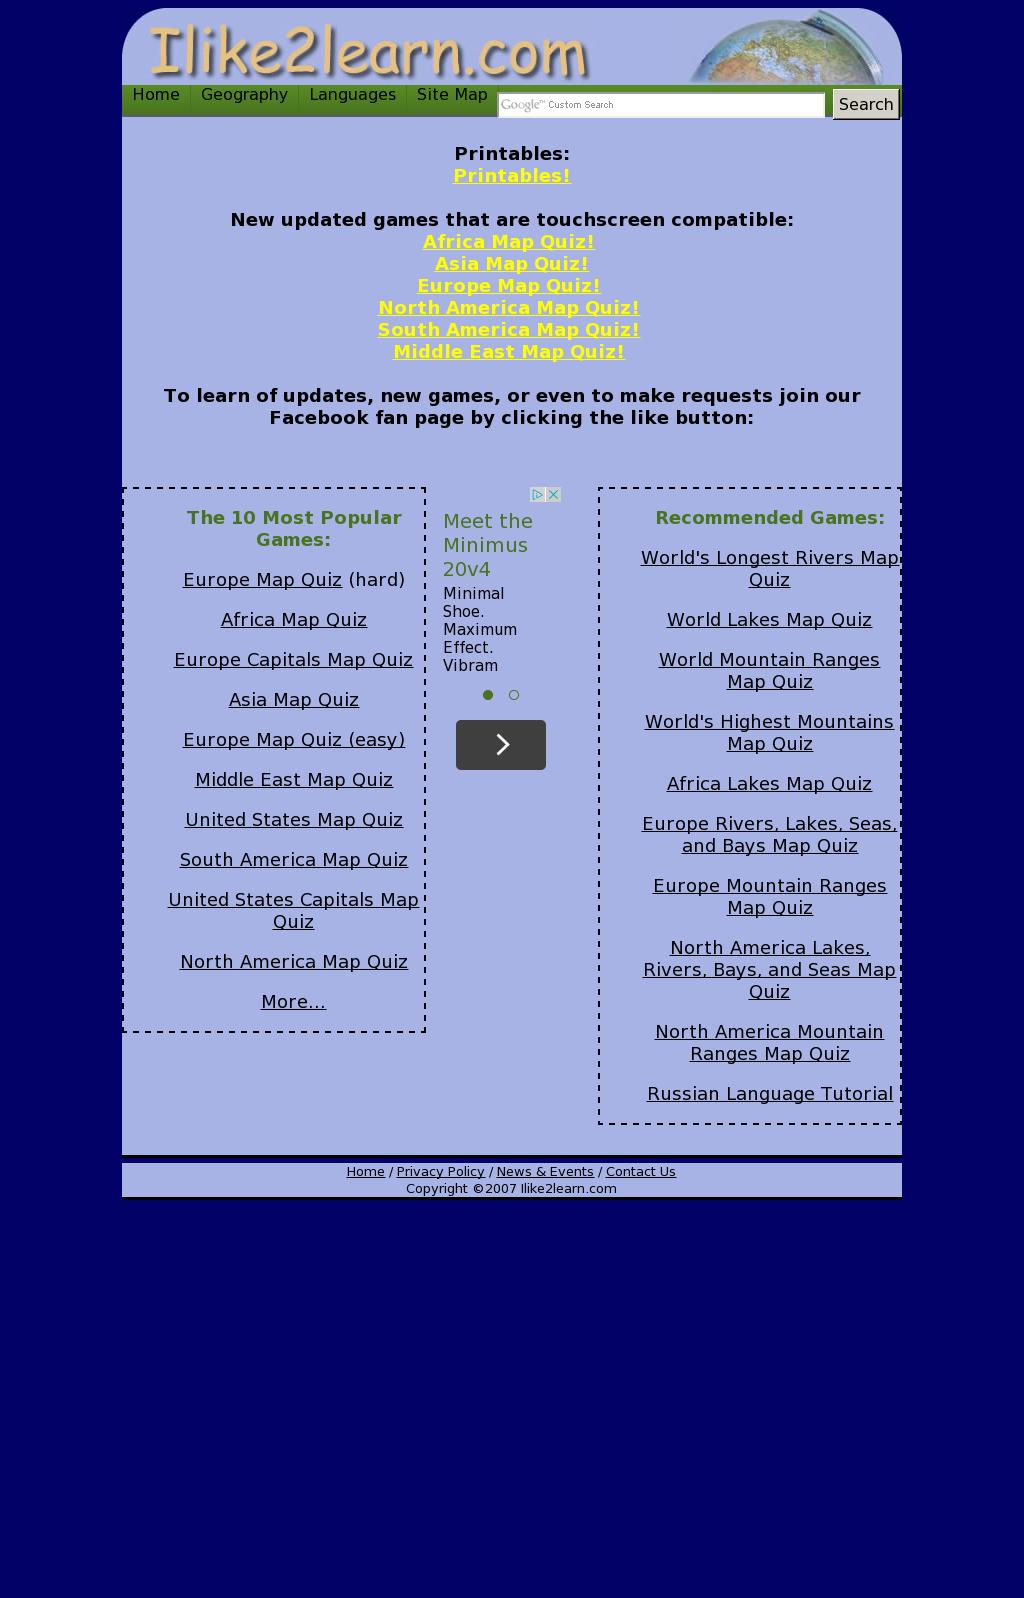 Ilike2Learn Compeors, Revenue and Employees - Owler ... on eastern mississippi, eastern africa, eastern germany, eastern russia, eastern world, eastern european, eastern belarus, eastern canadian islands, eastern russians, eastern italy, eastern asia, eastern middle east, eastern african slave trade, eastern western america, eastern mediterranean, eastern baltic, eastern map, eastern turkey, eastern north america, eastern countries,